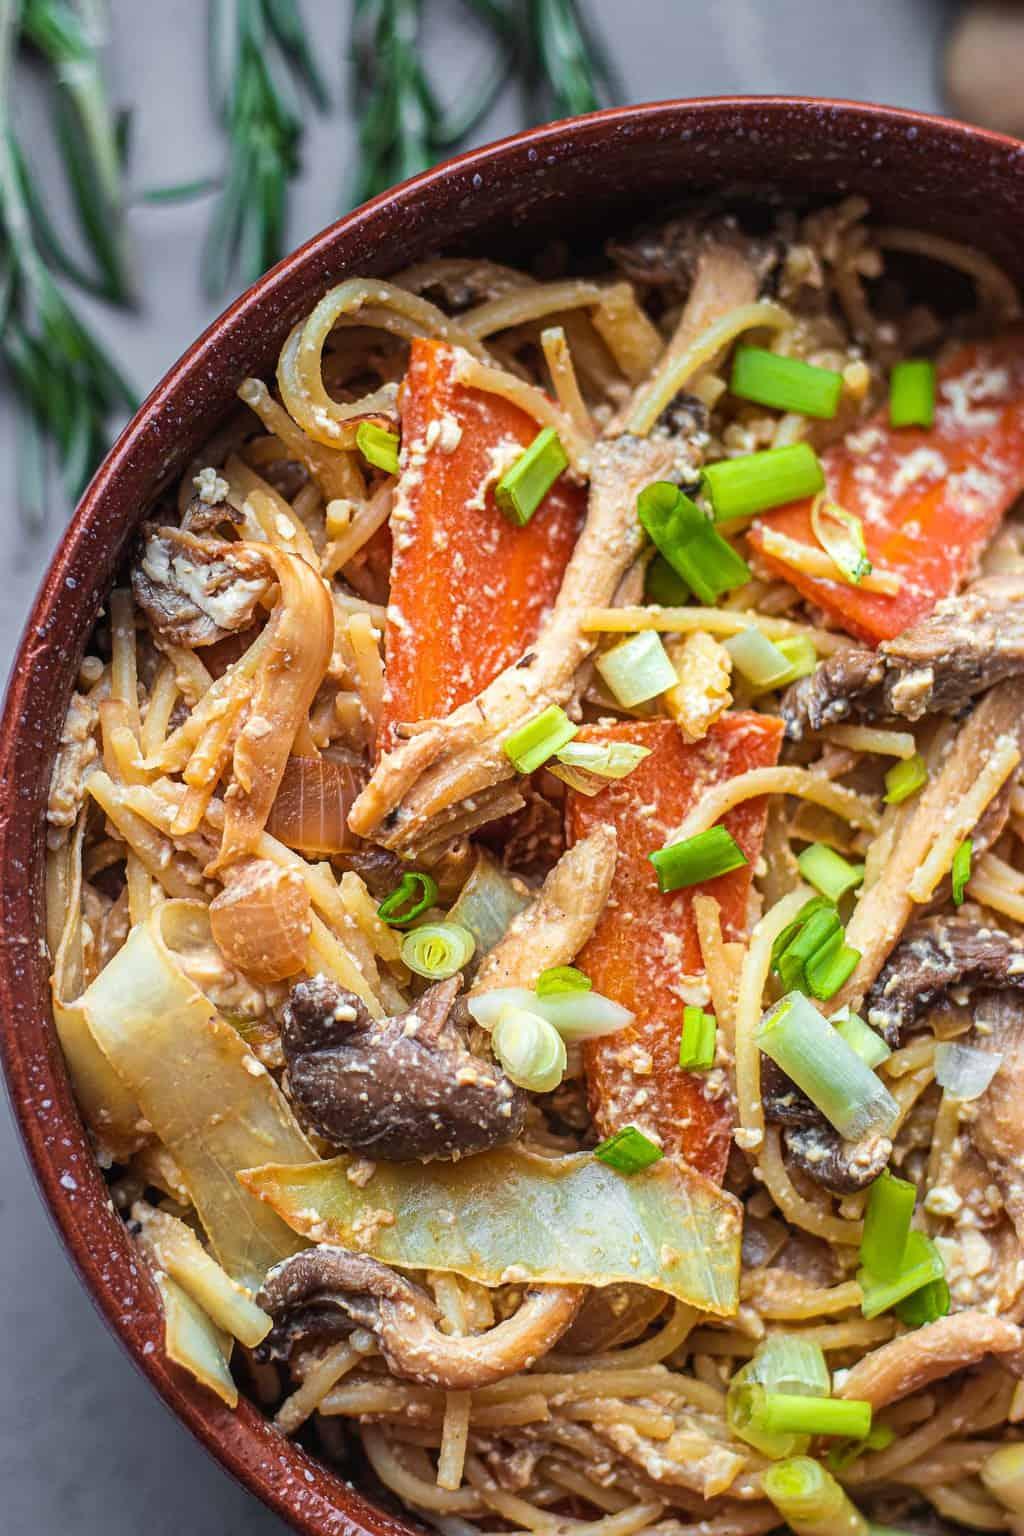 Vegan mushroom tofu stir-fry